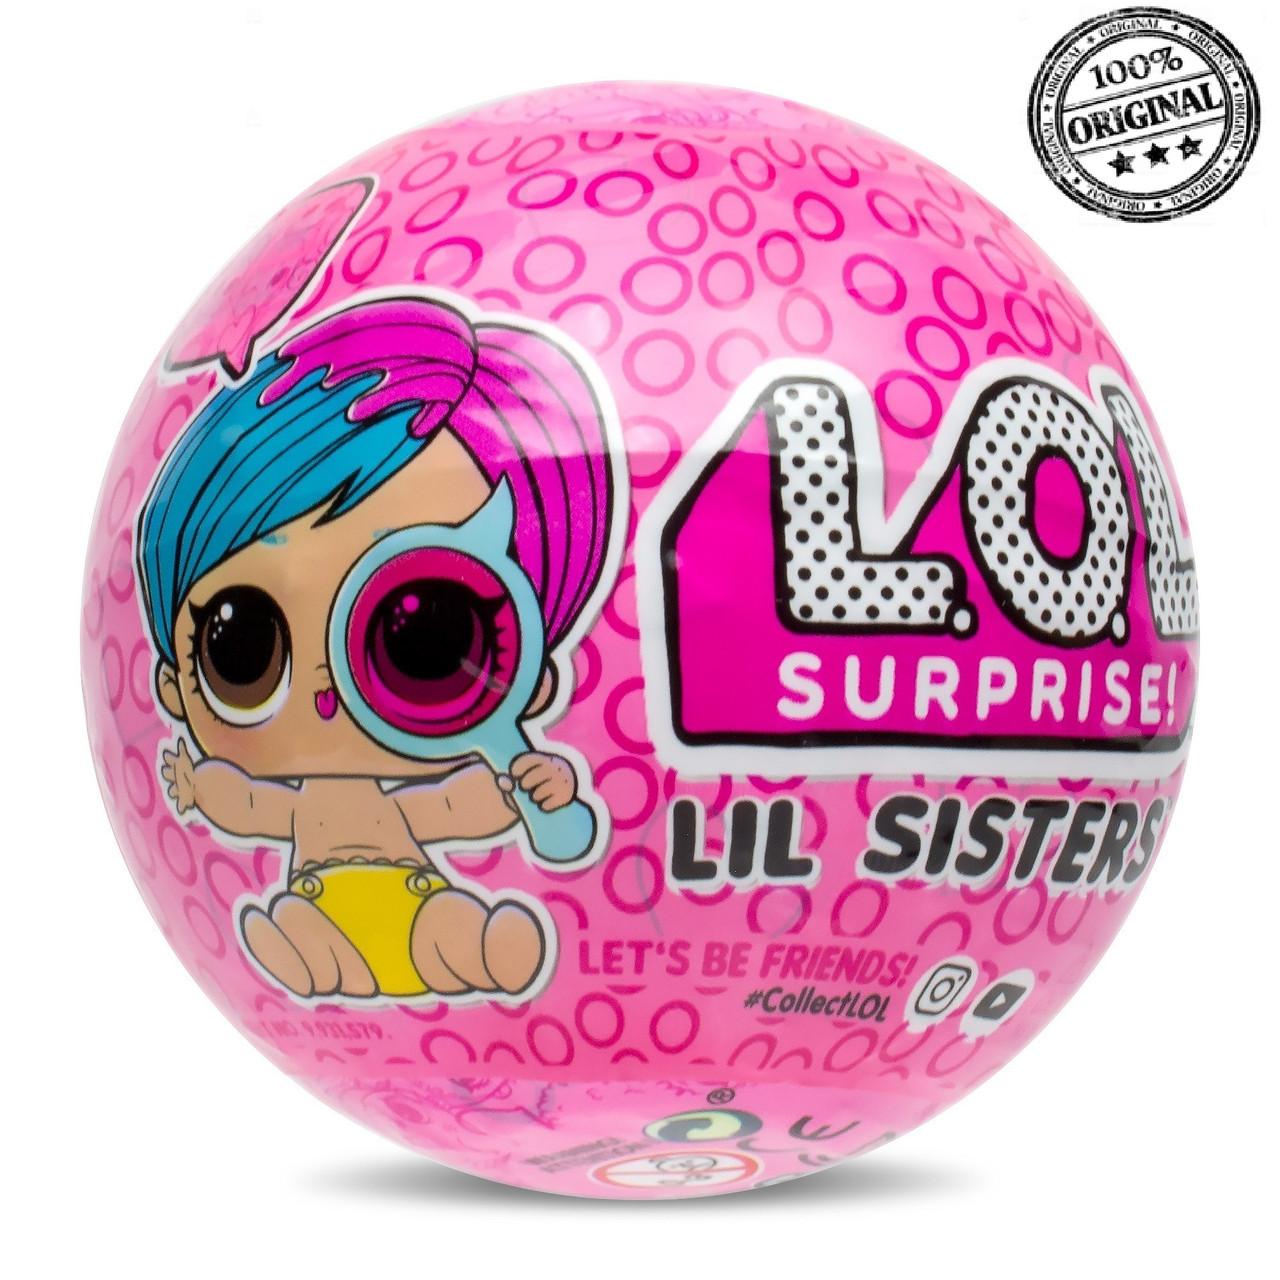 LOL Surprise - Маленькая сестренка в шарике, LIL Sisters, 4 серия, 2 волна, Декодер «Eye Spy»